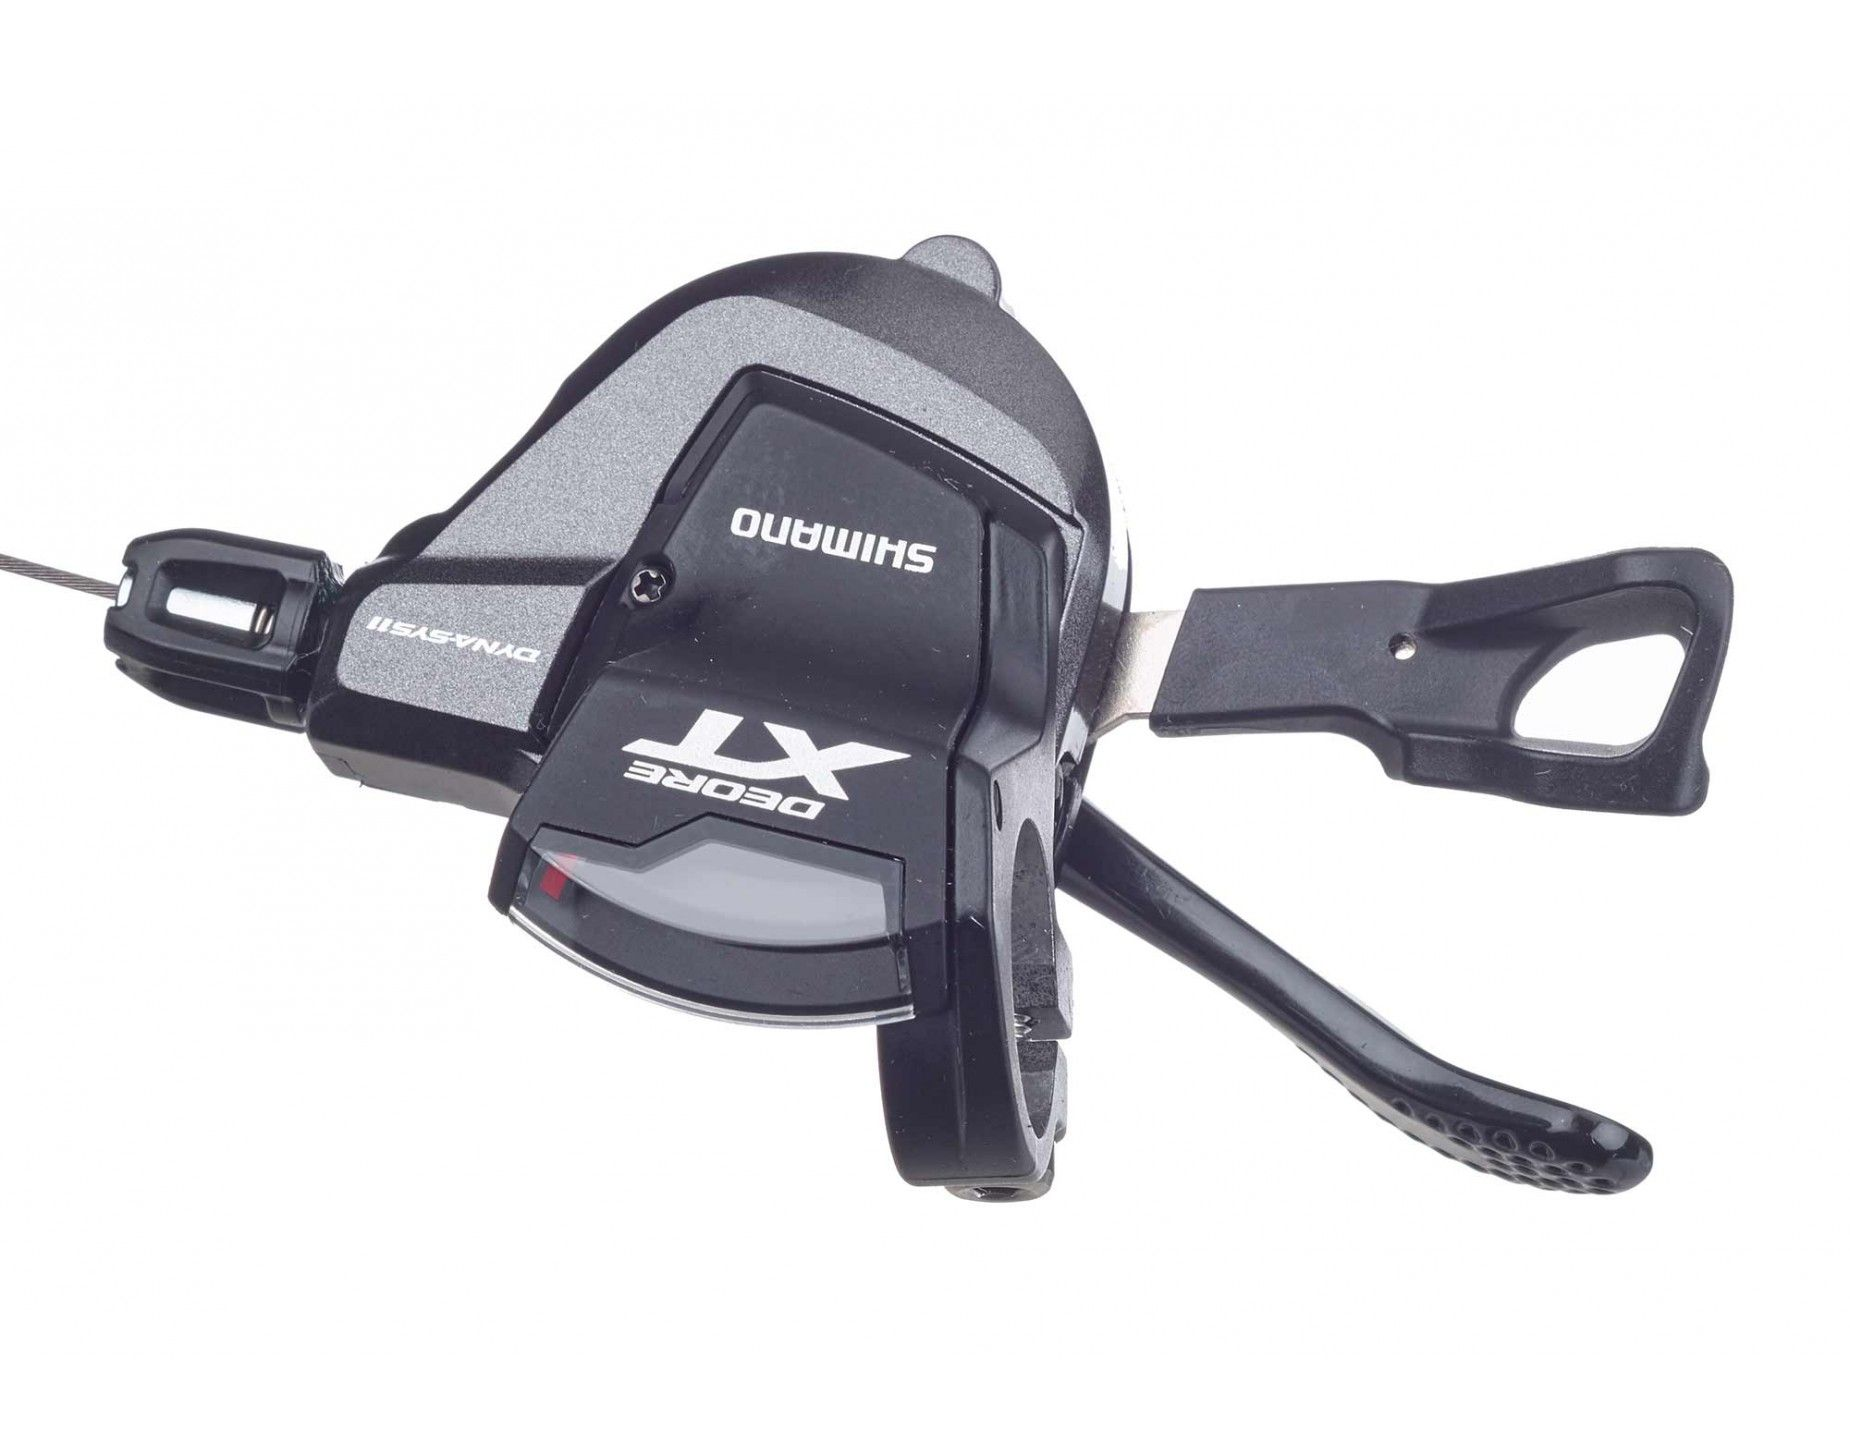 Manette Shimano Deore XT M8000 11V droite